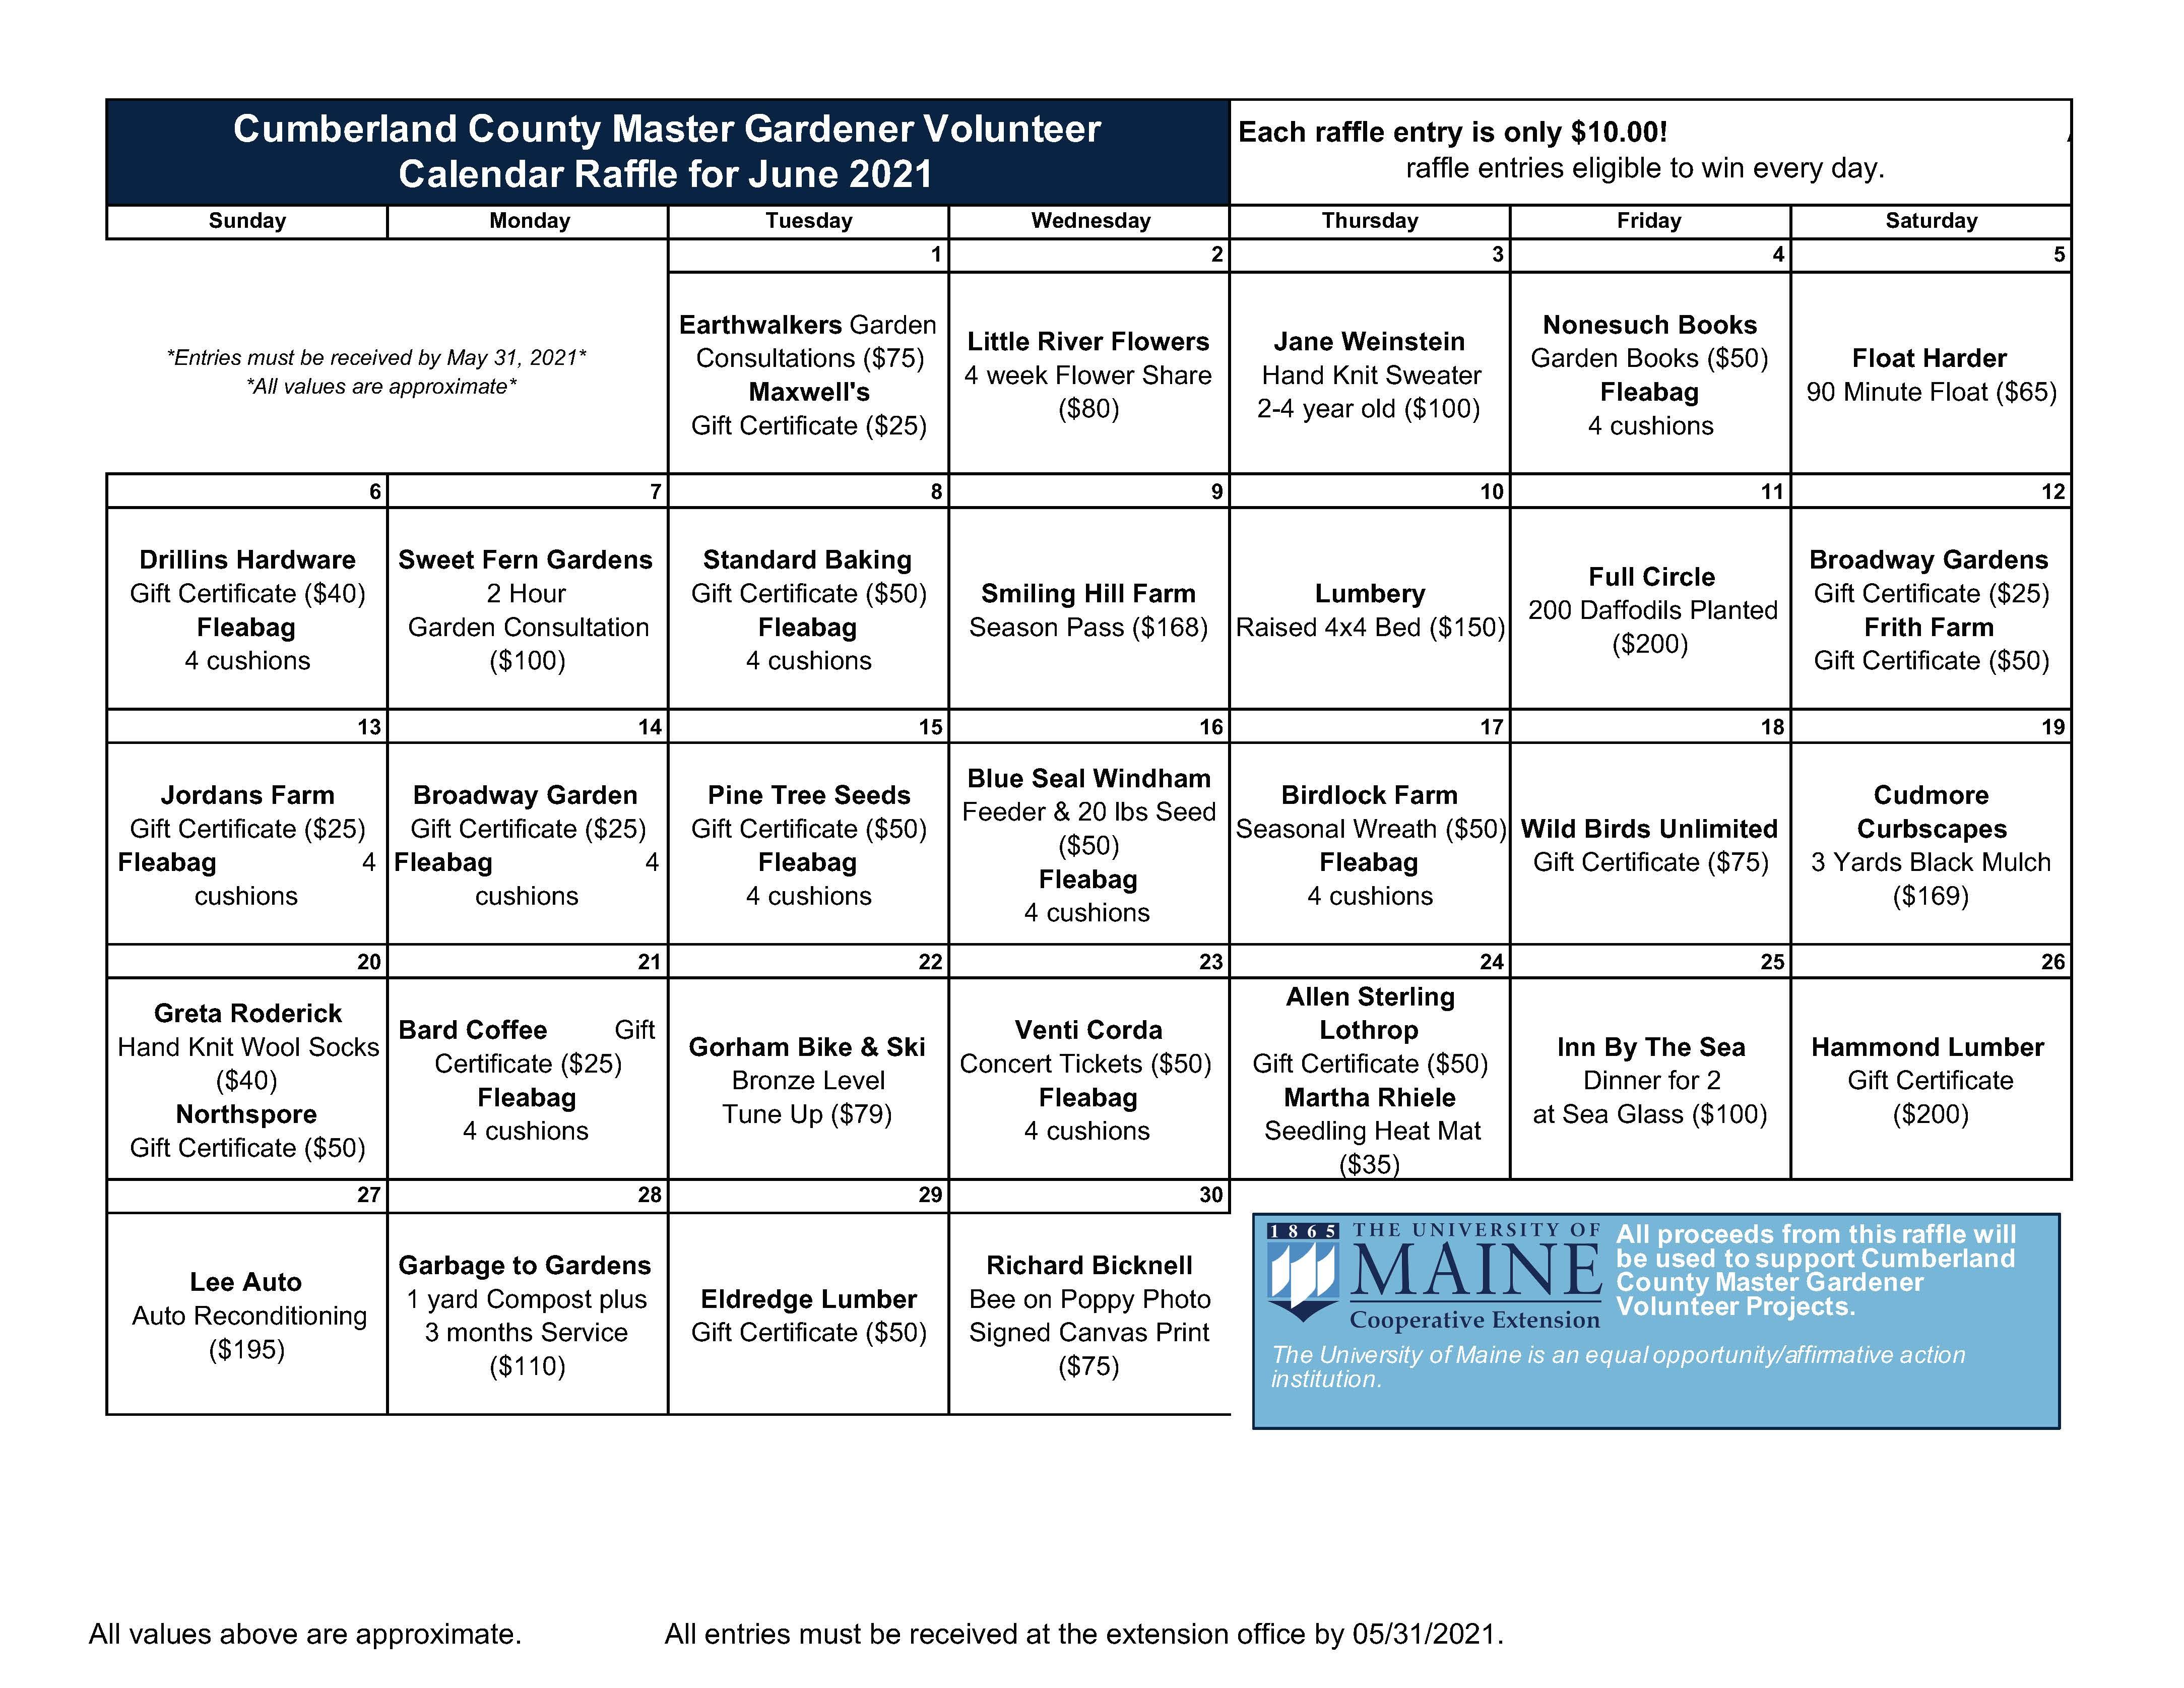 image of 2021 raffle calendar